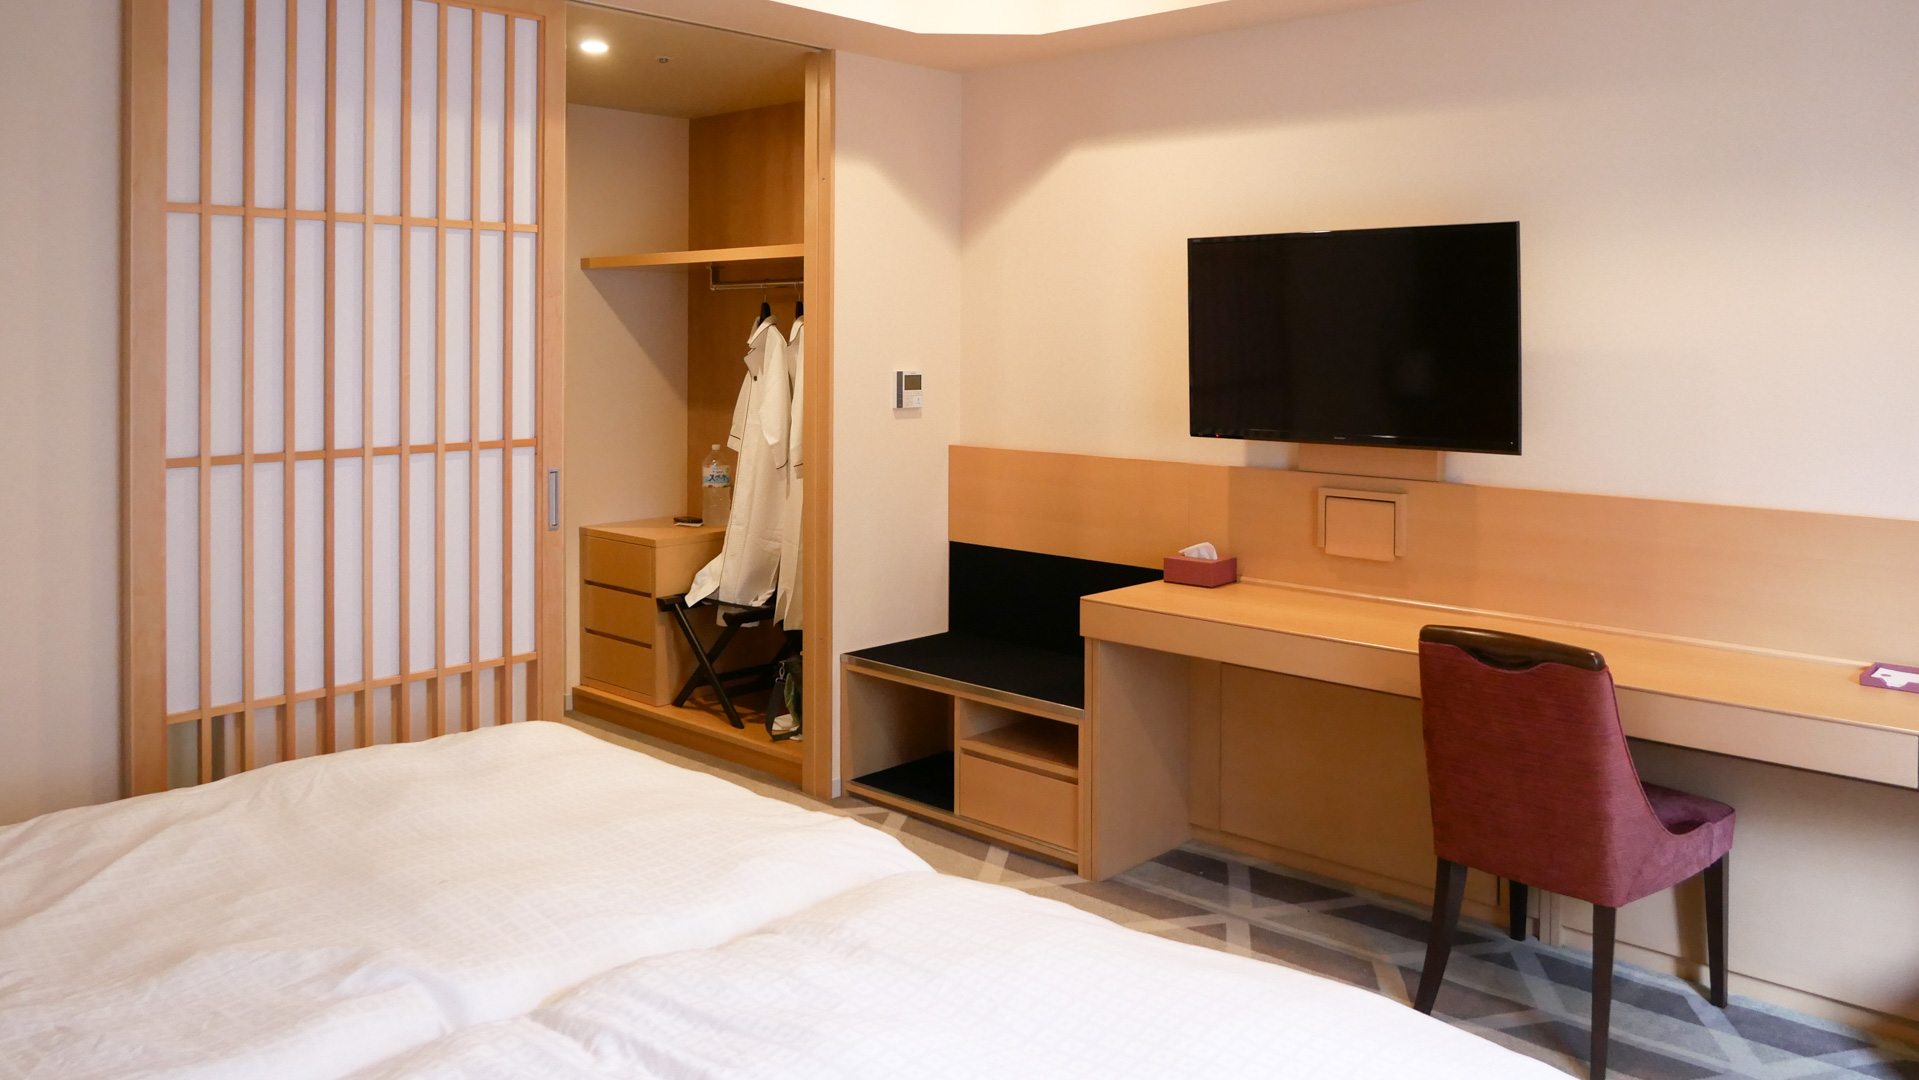 tokyo japan hotels fittwotravel.com